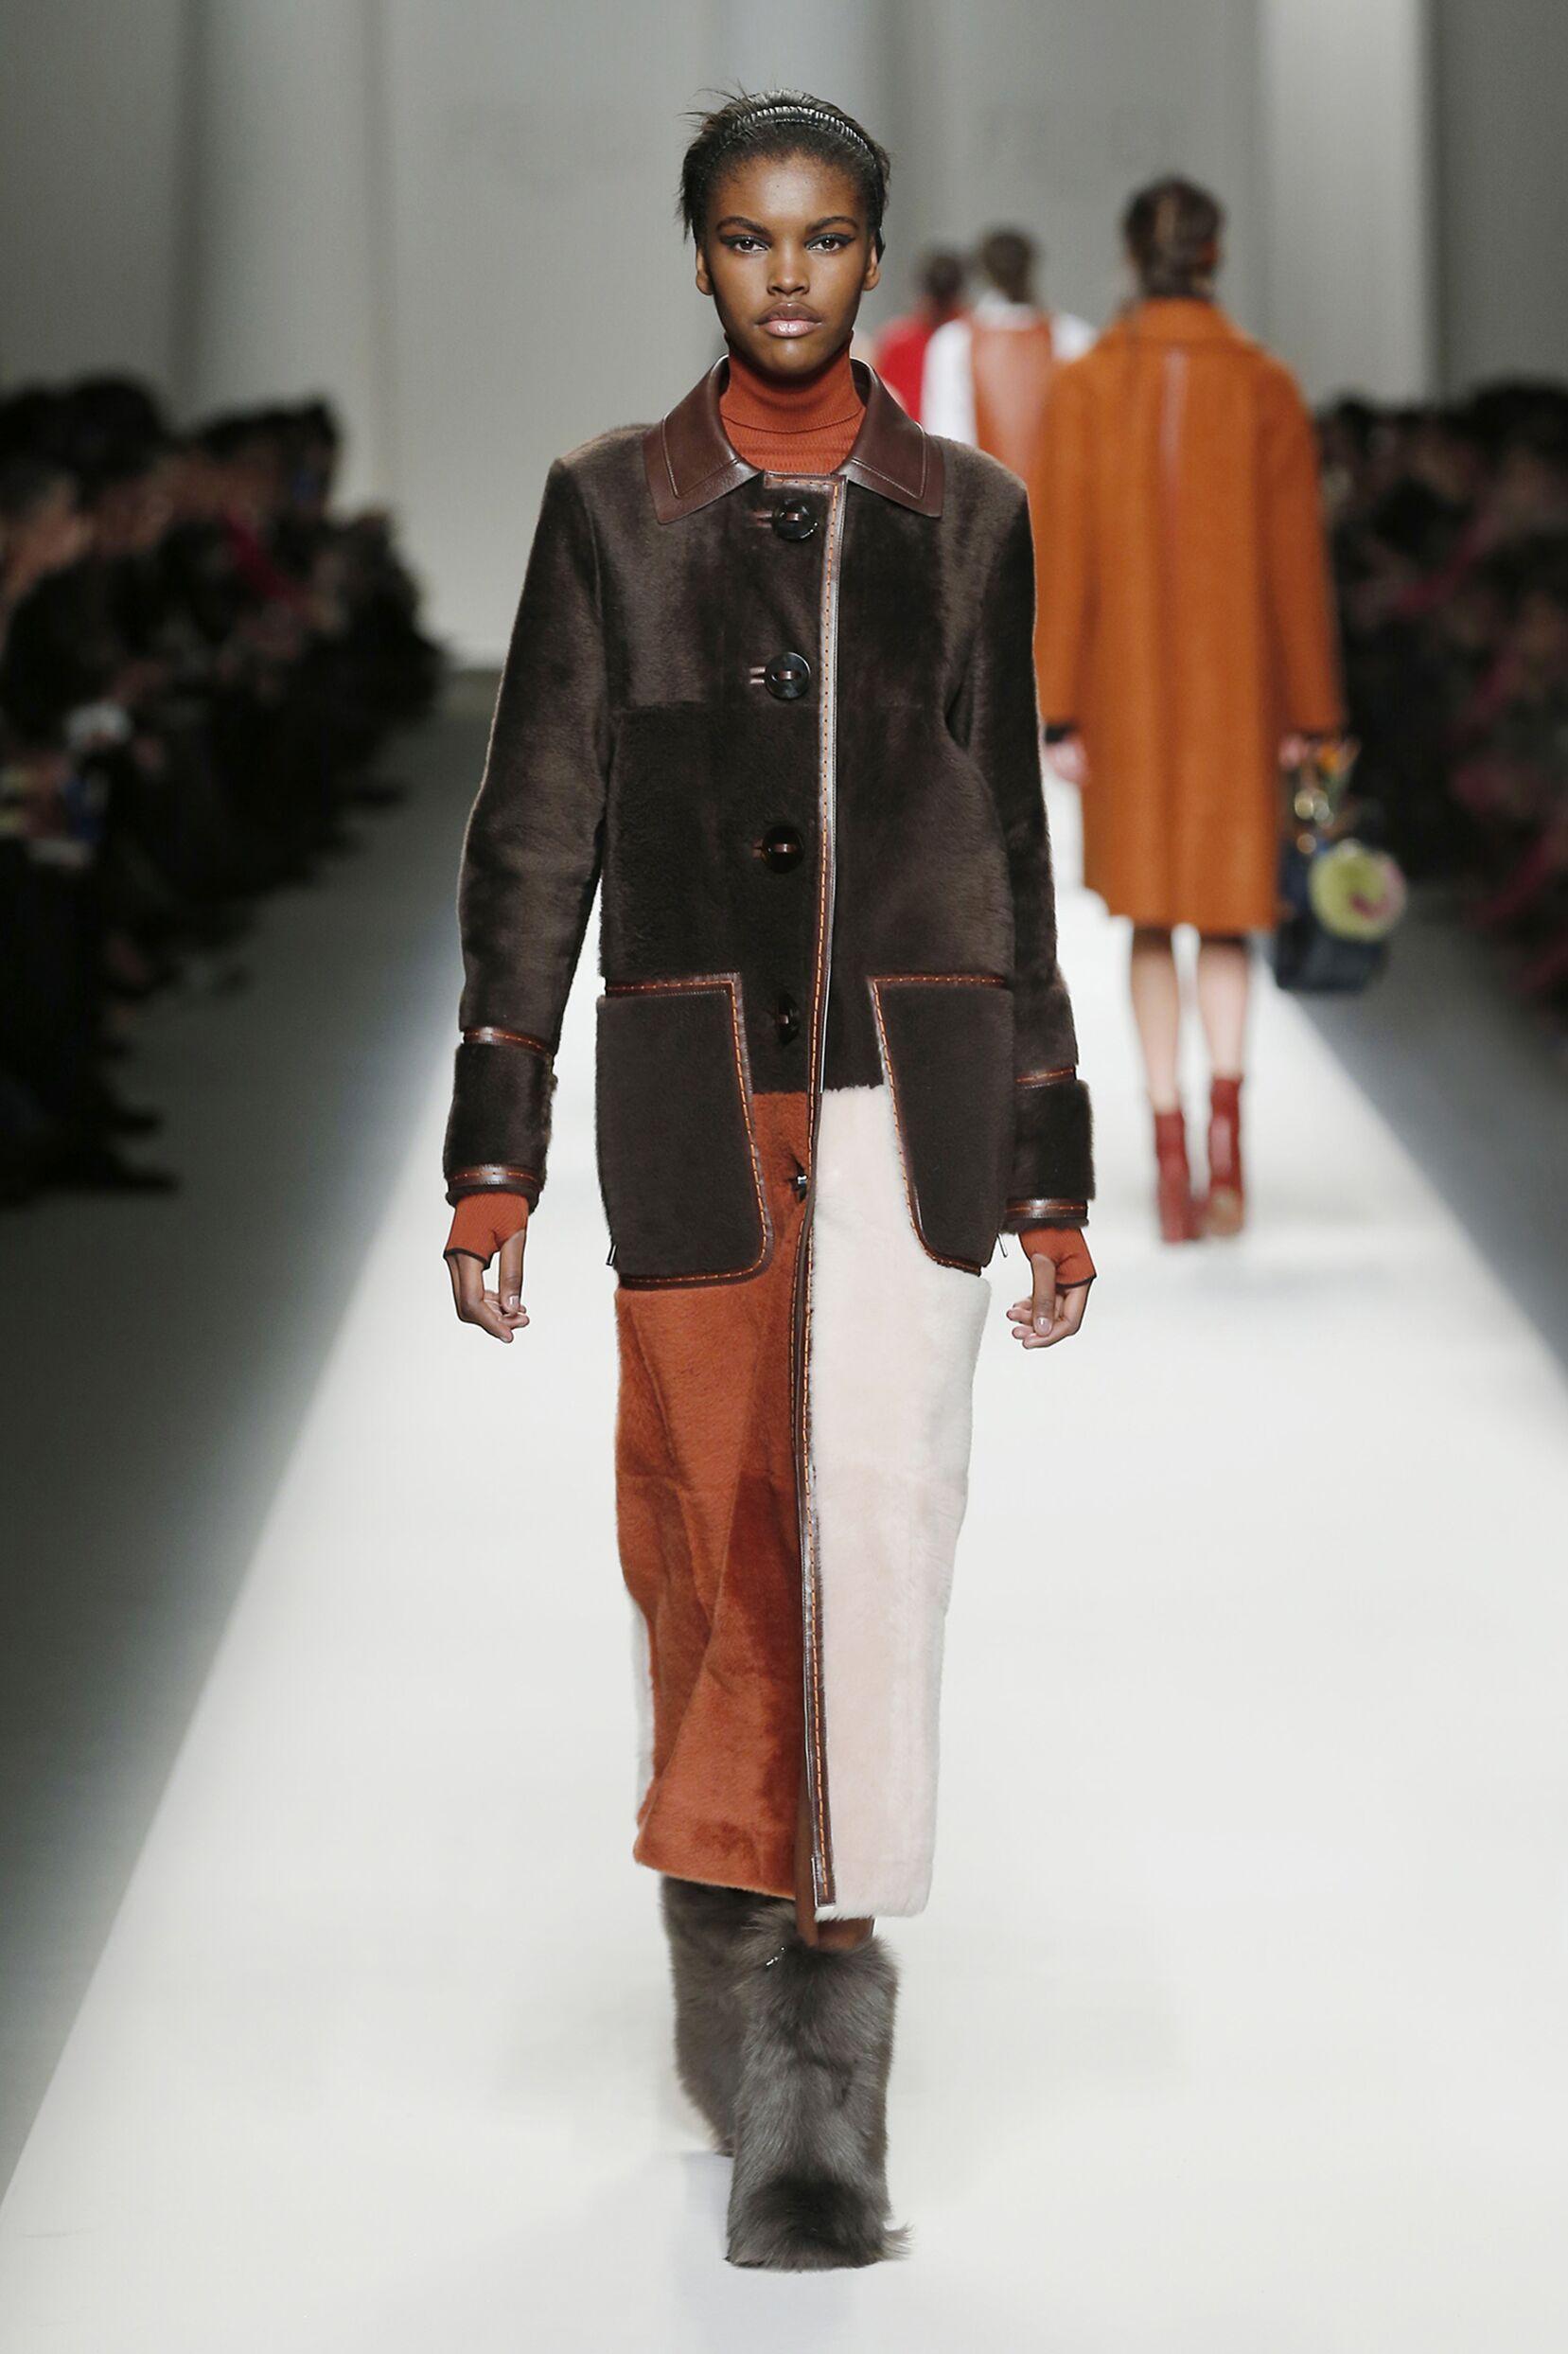 Fashion Woman Model Fendi Collection Catwalk